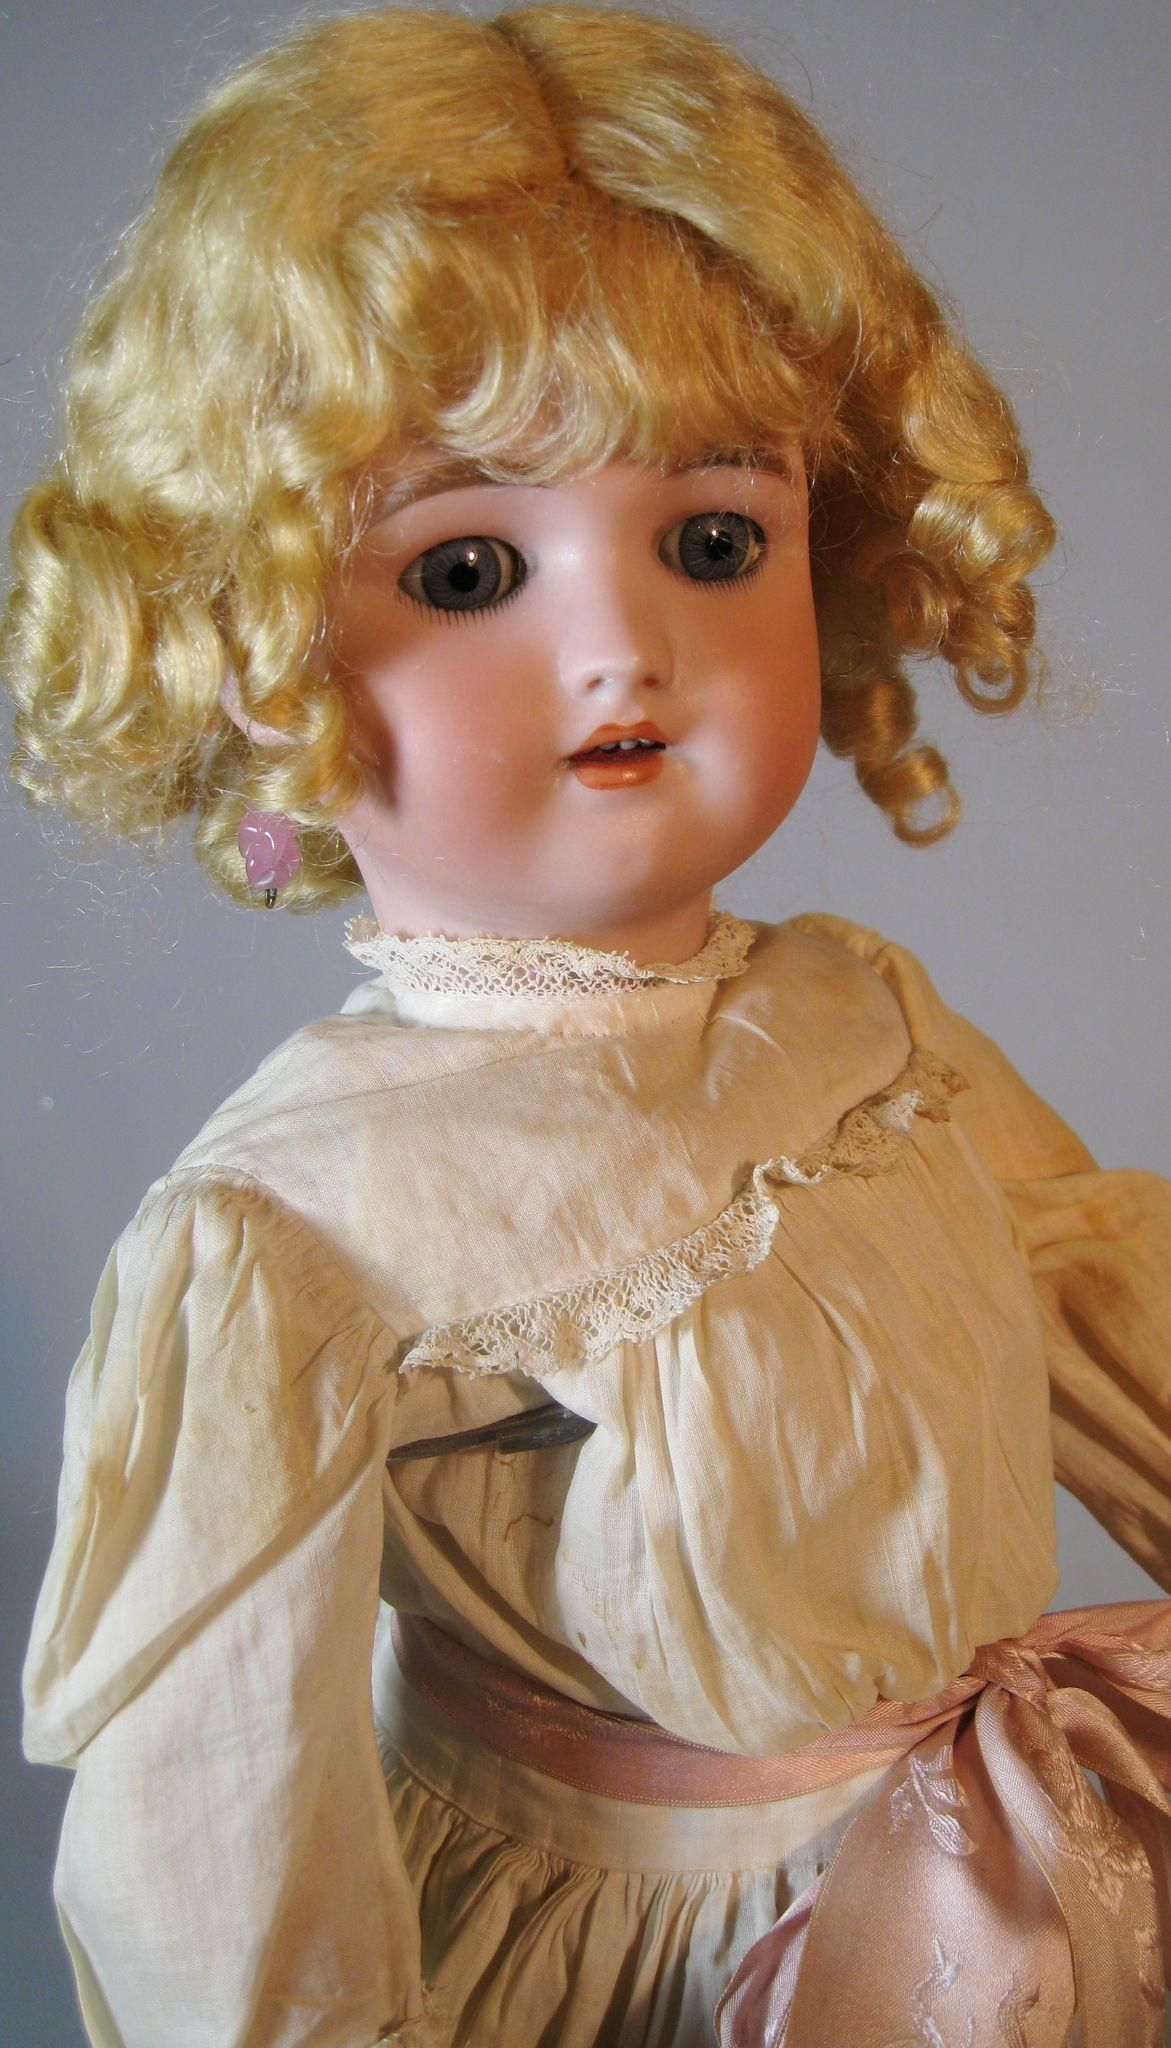 "18"" Simon Halbig Handwerck Antique German Doll ~ All Antique Original Clothing - 18"" Simon Halbig Handwerck Antique German Doll ~ All Antique Original Clothing"